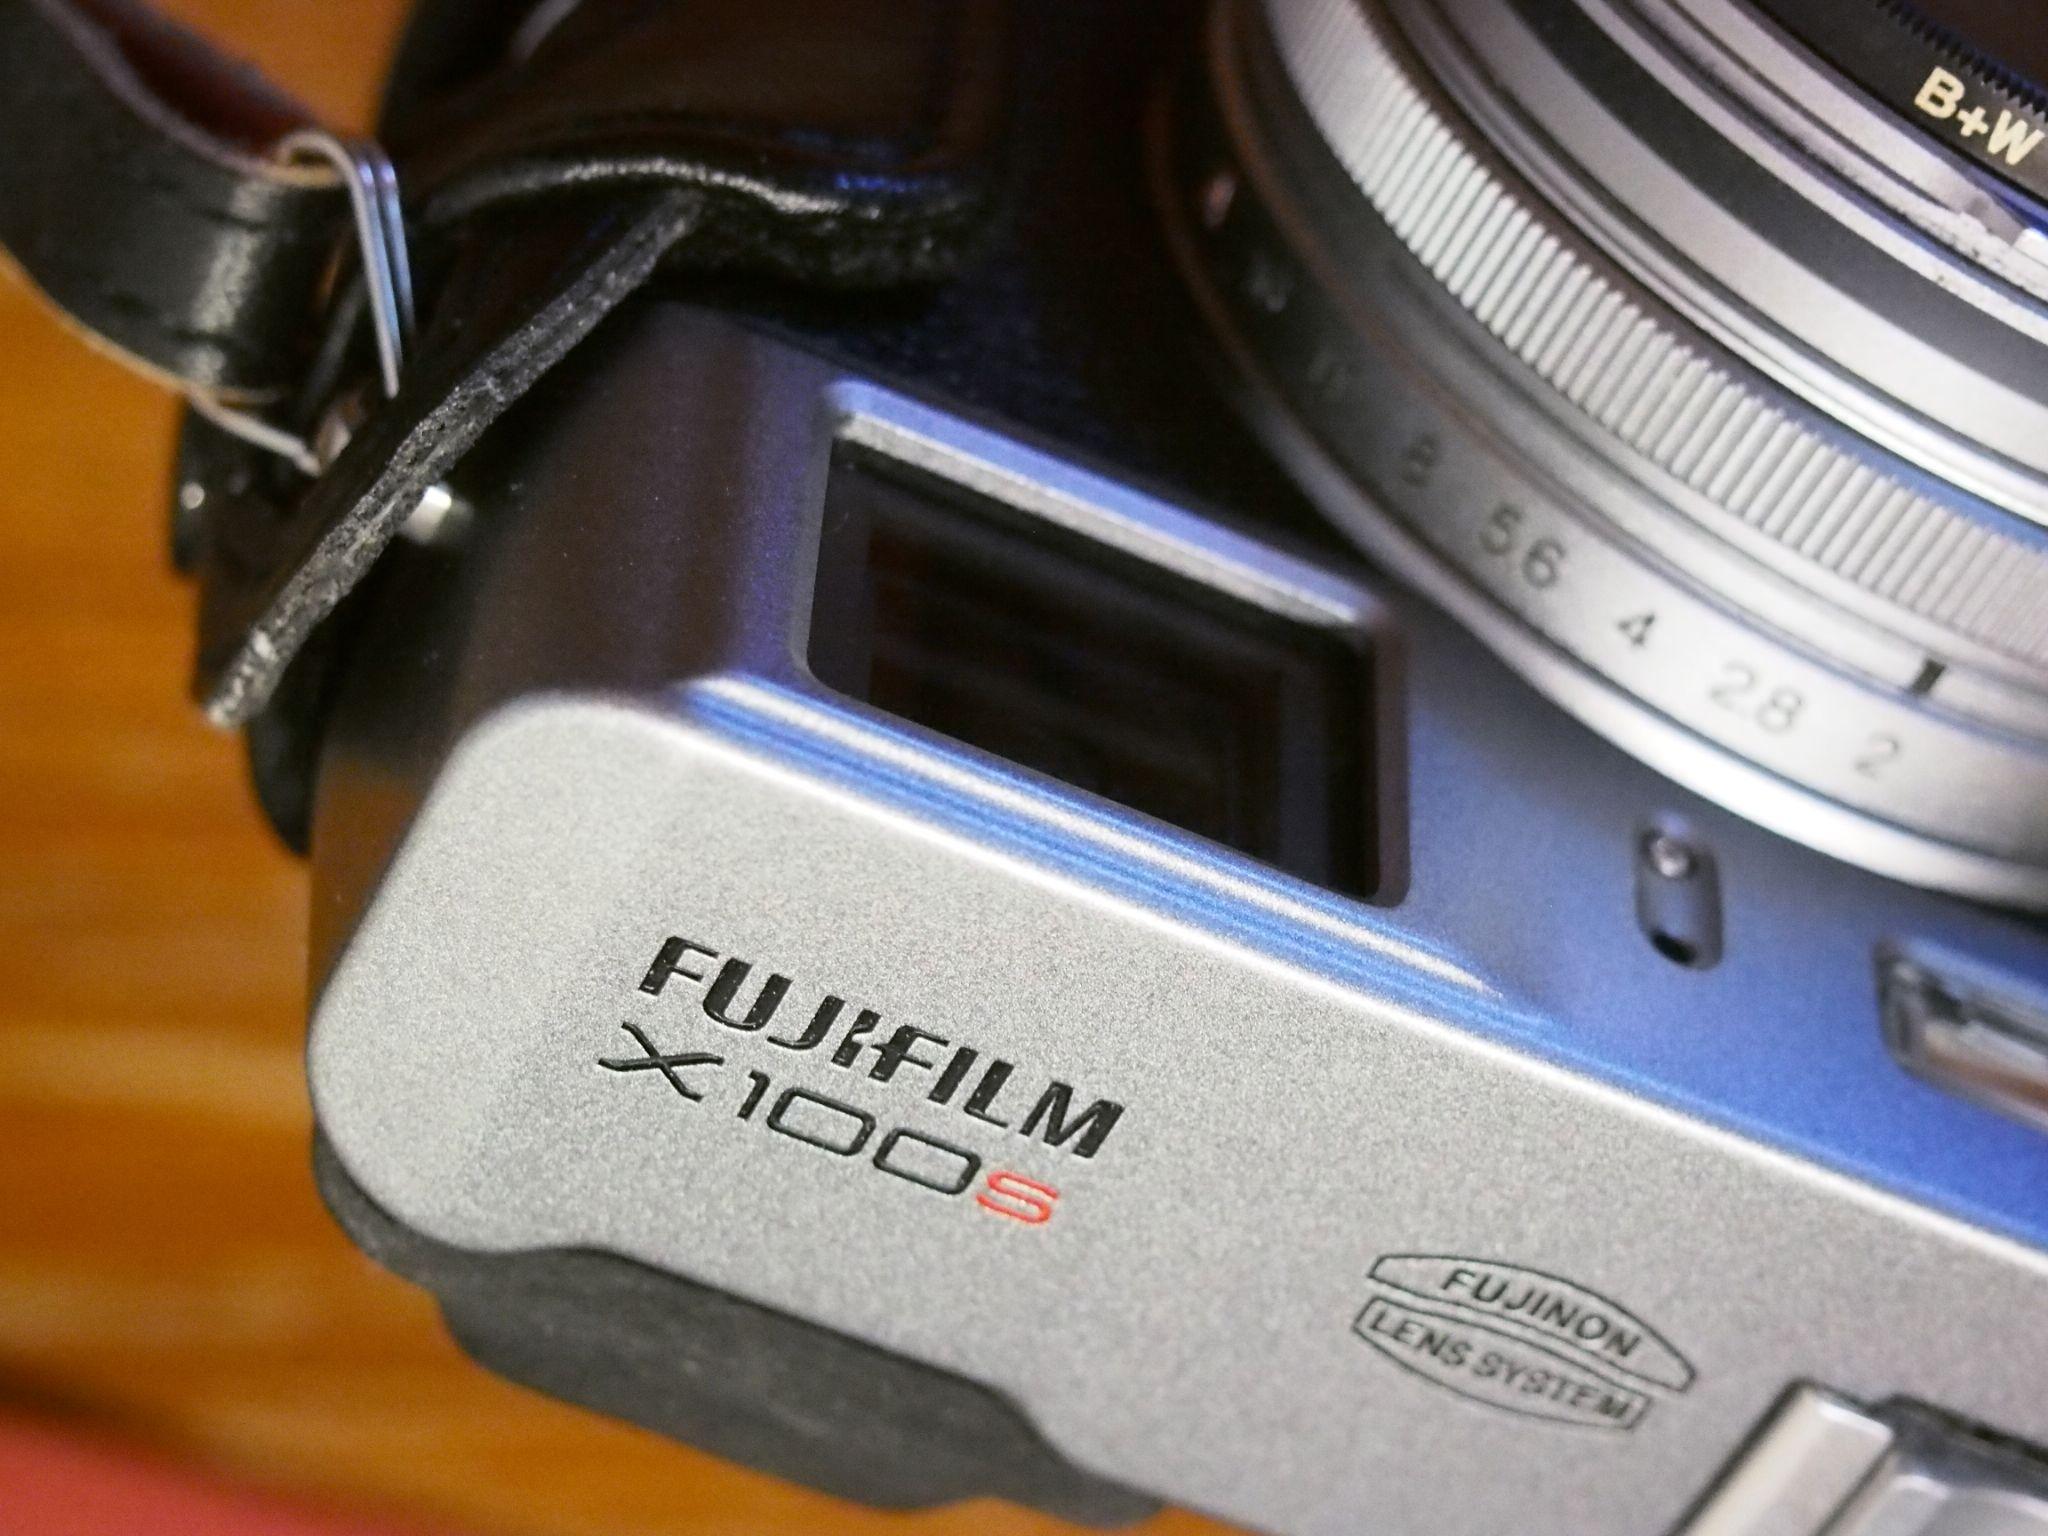 fujifilm x100s by Victor Kam